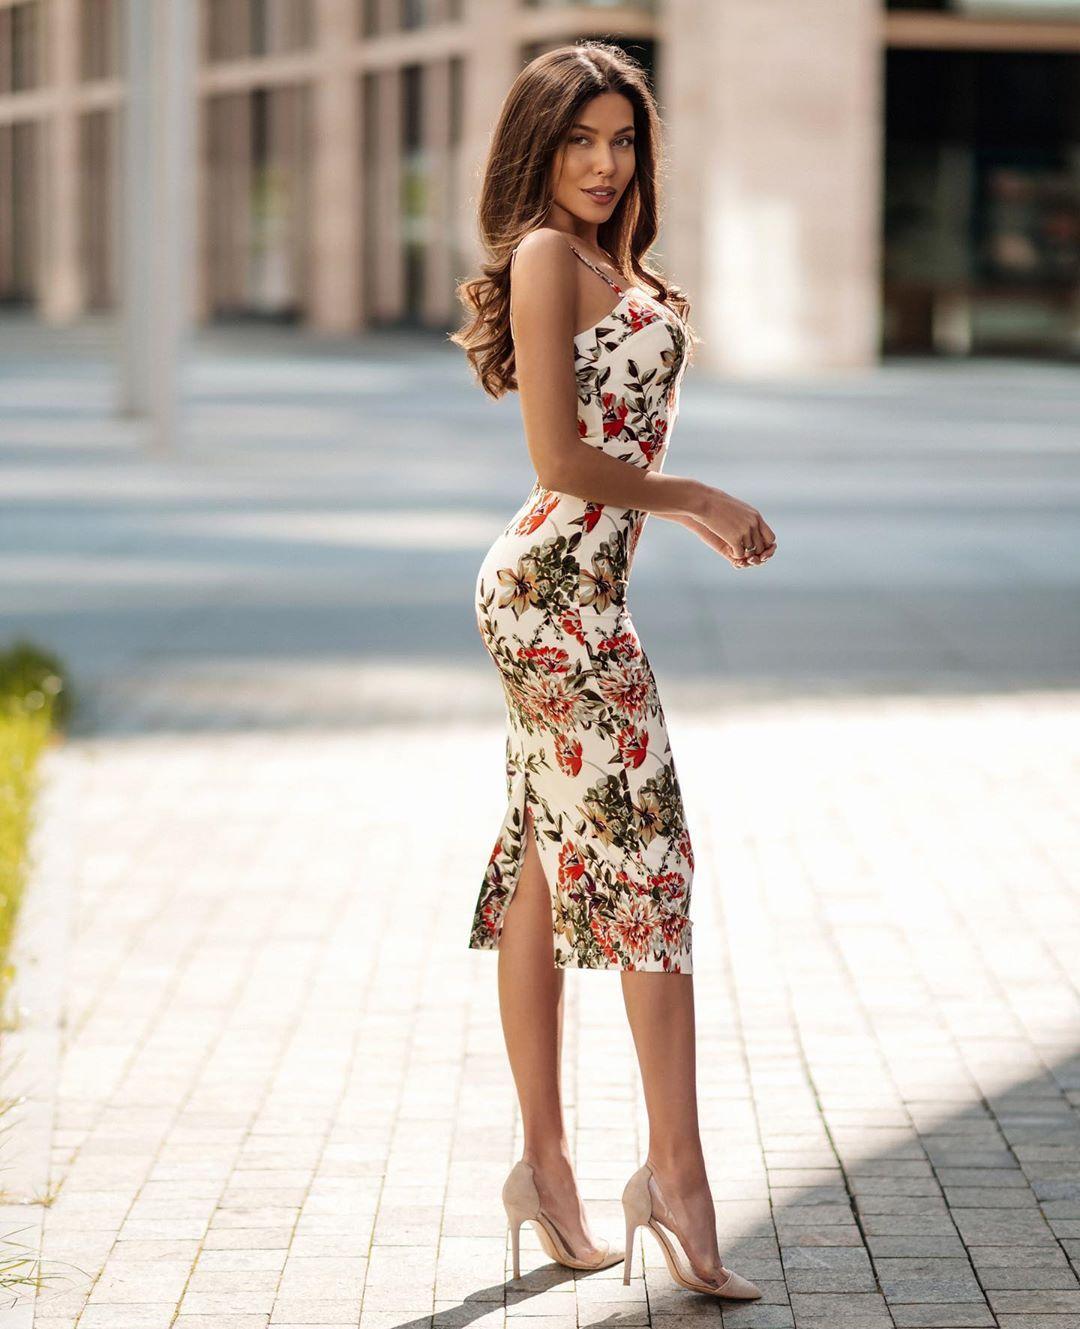 Katerina-Sozinova-Wallpapers-Insta-Fit-Bio-4